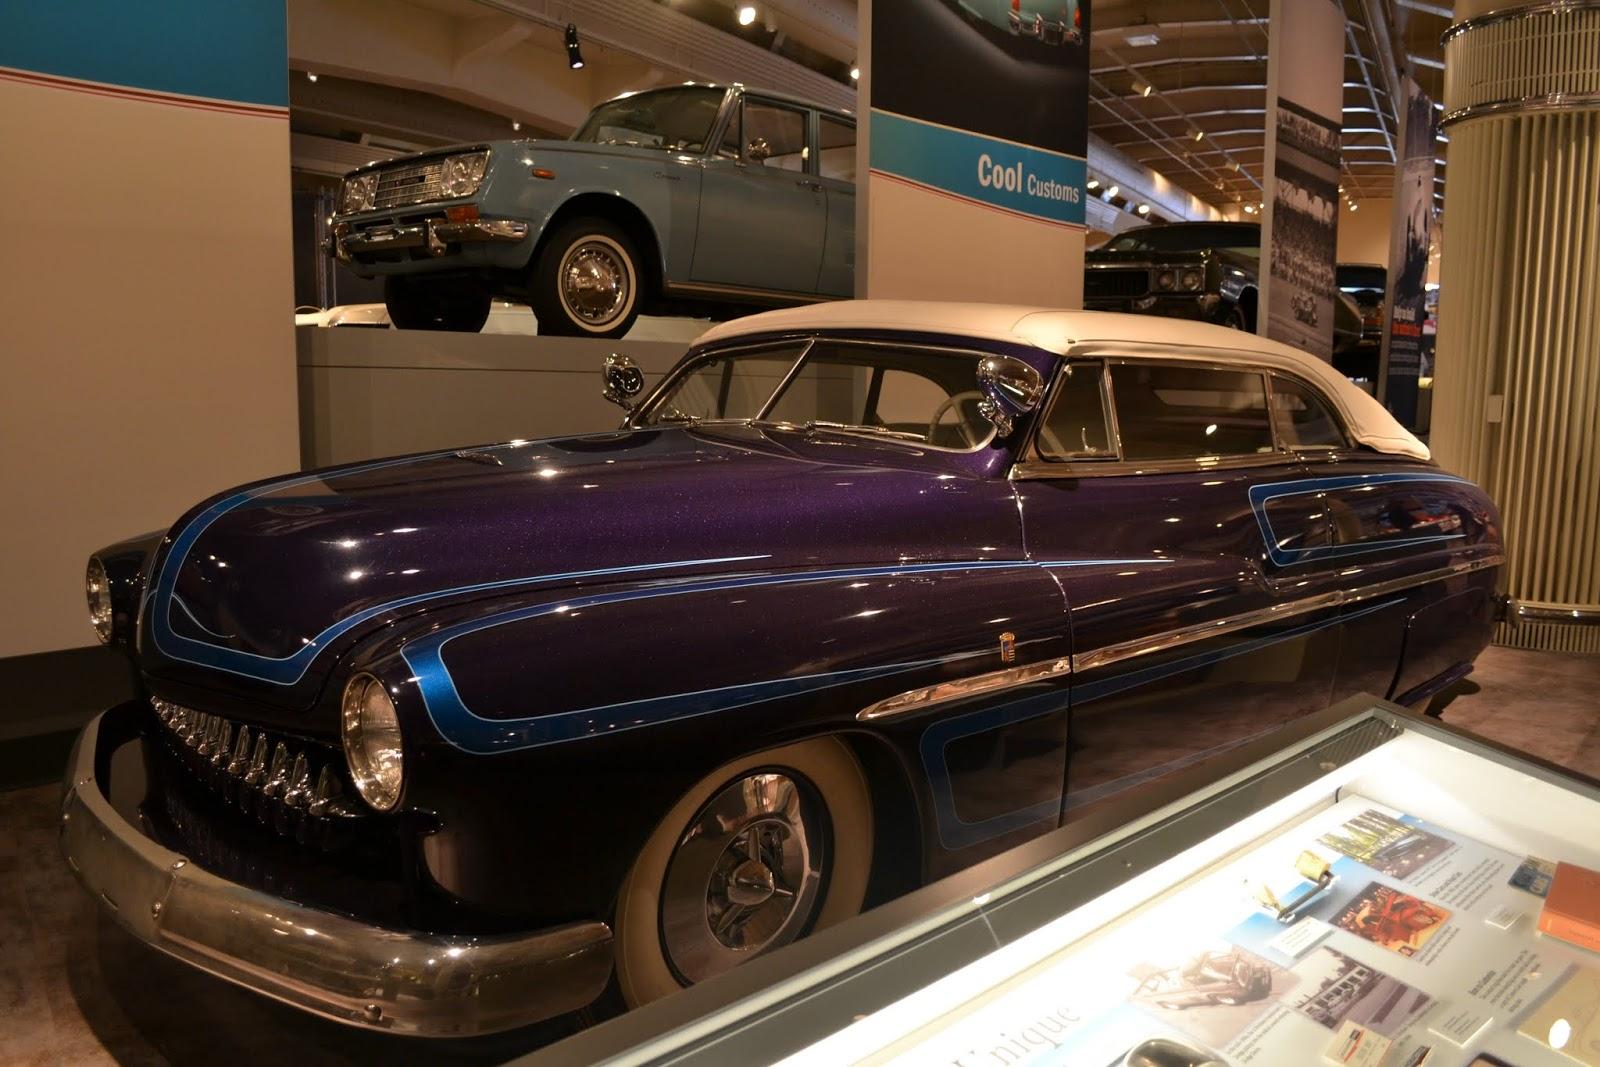 1949 Mercury. Музей Генри Форда. Дирборн, Мичиган (Henry Ford Museum, Dearborn, MI)